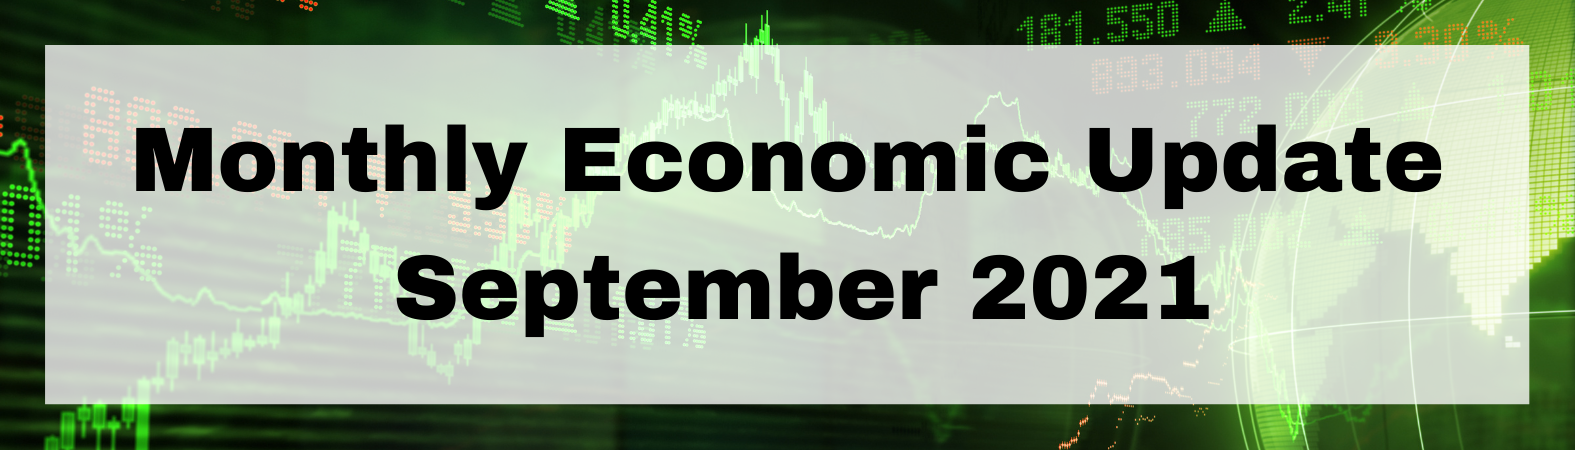 Monthly Economic Update September 2021 Thumbnail